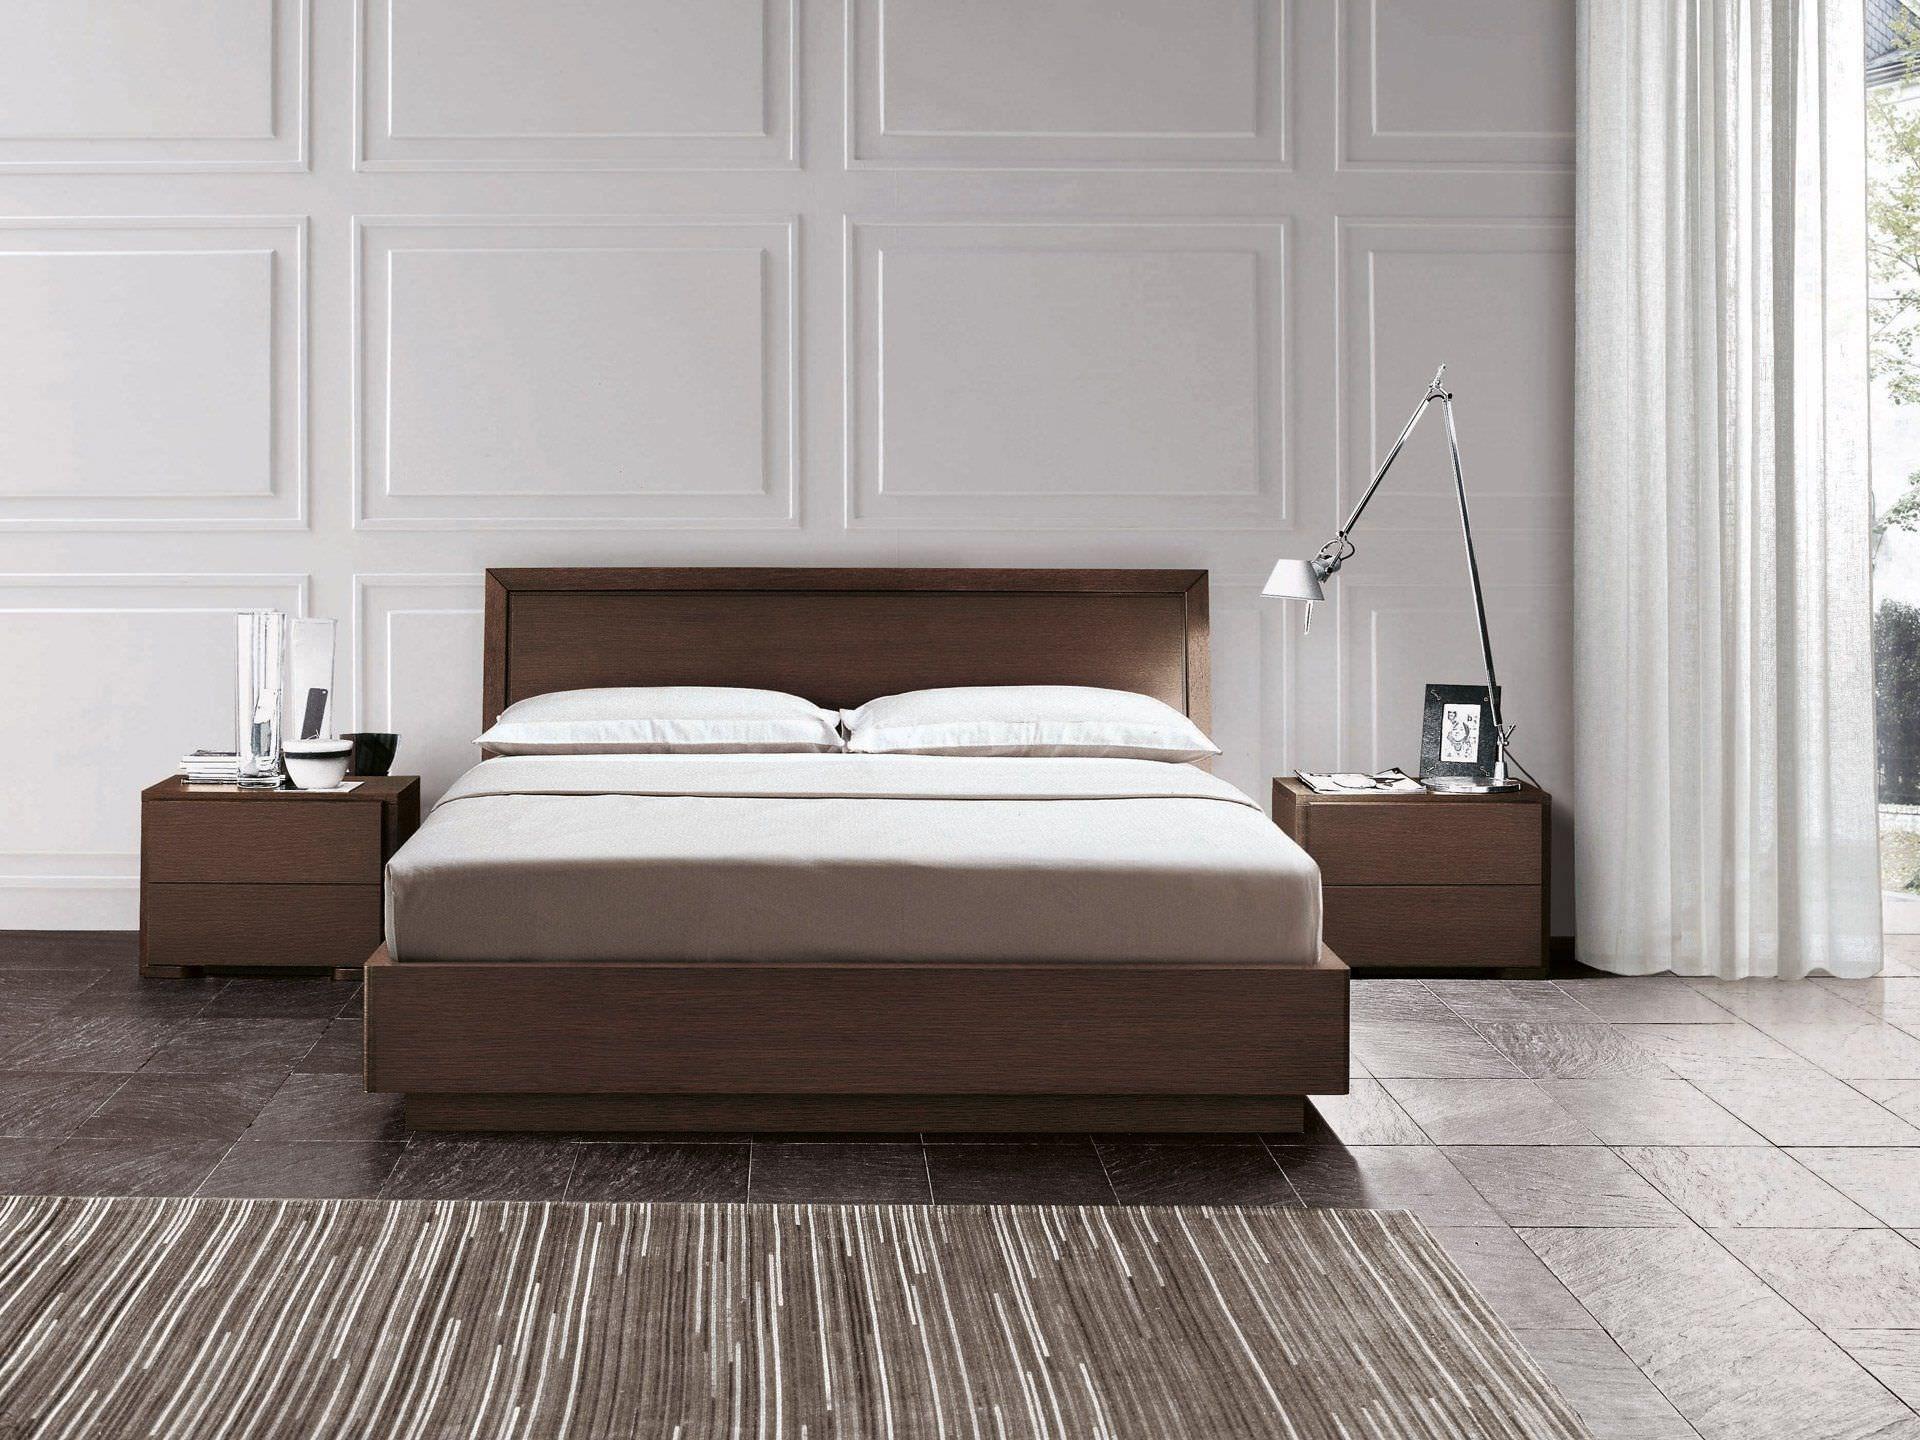 Resultado de imagen para camas de madera modelos modernos | Diseño ...